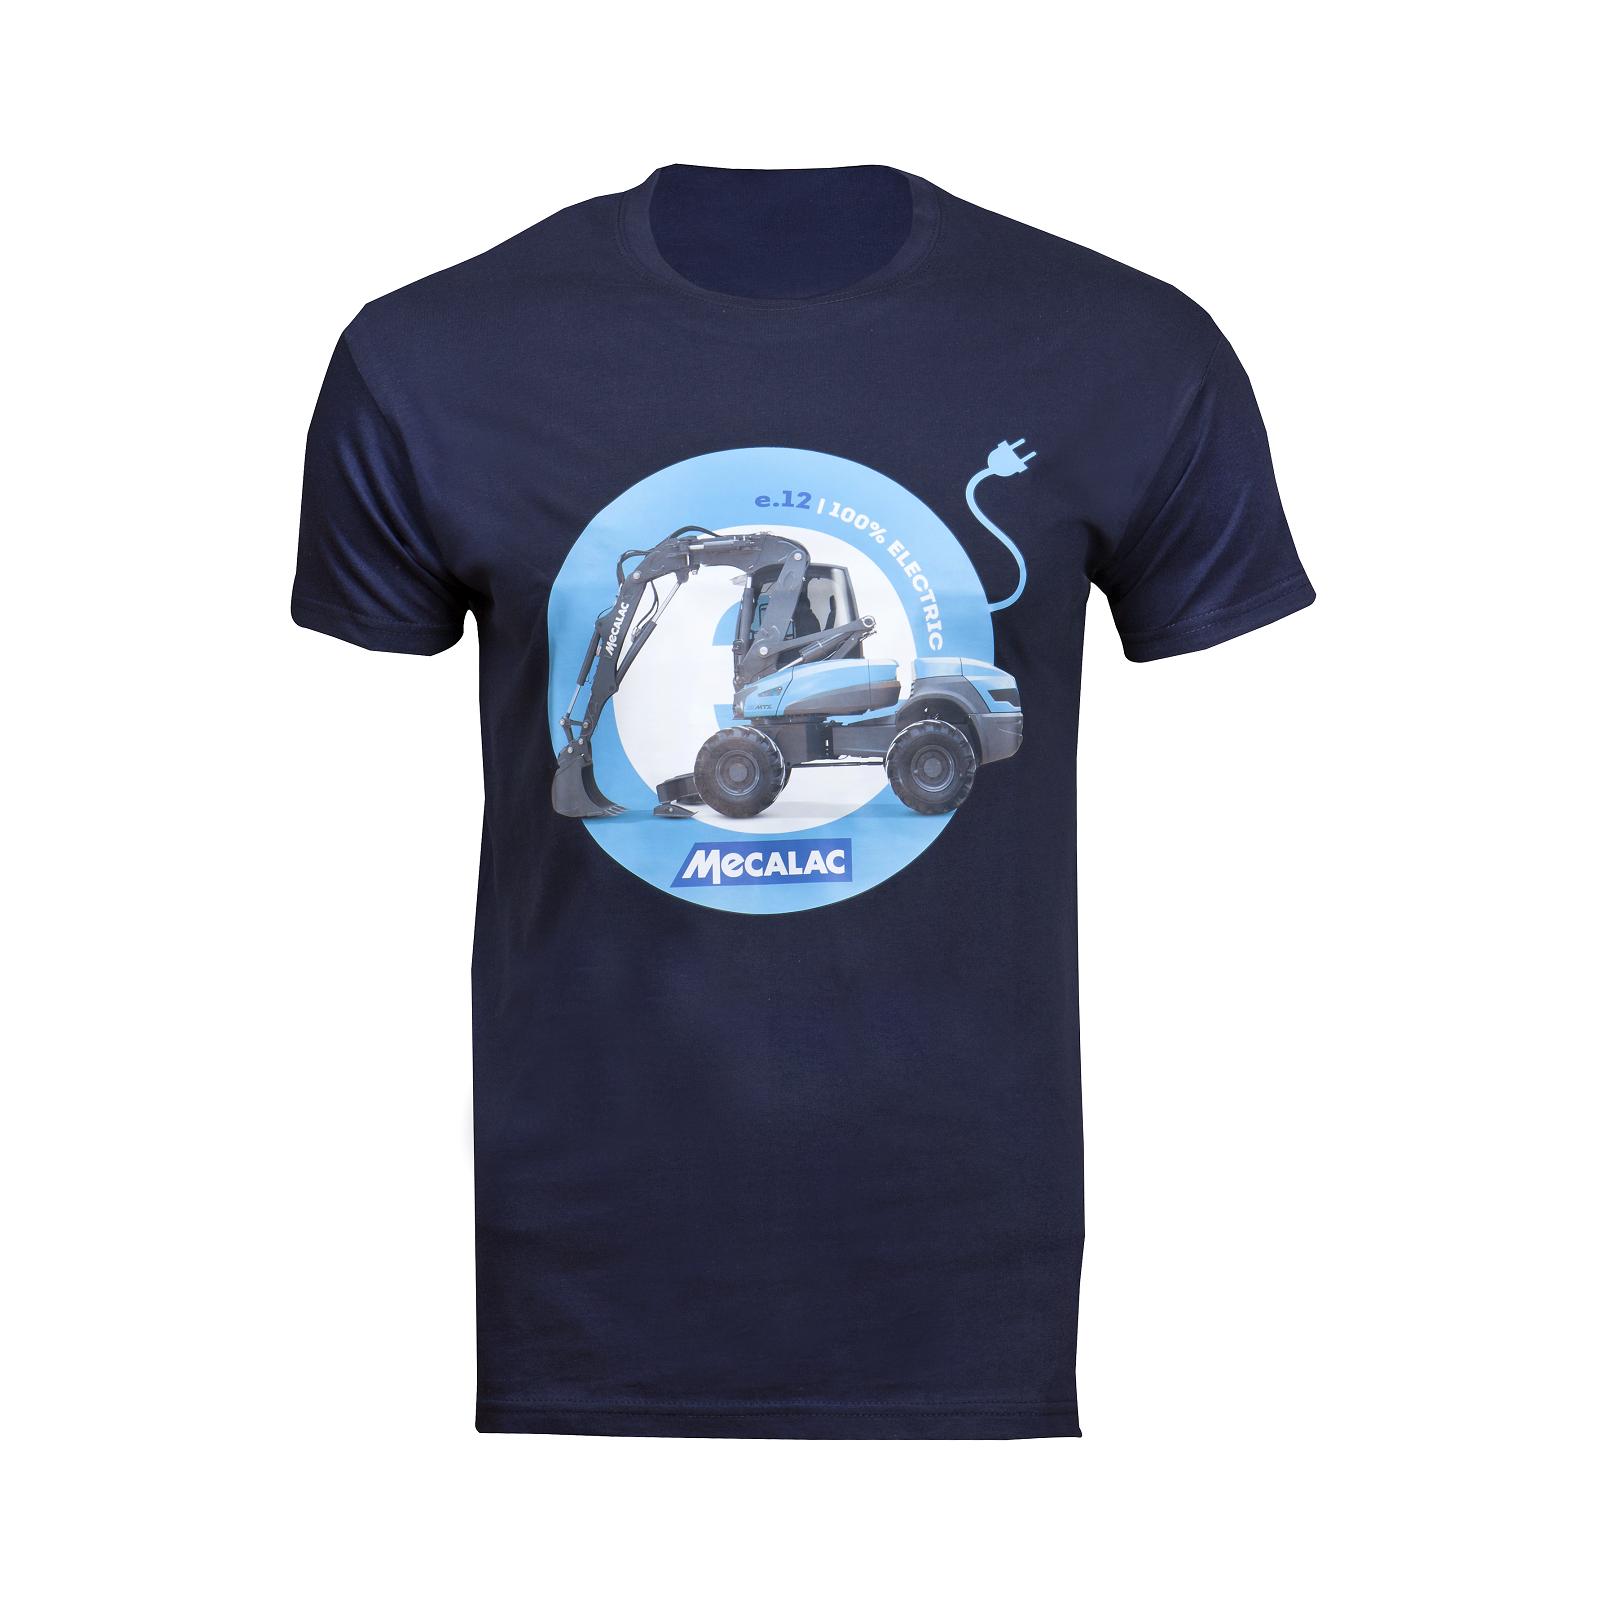 T-shirt e12 bleu foncé